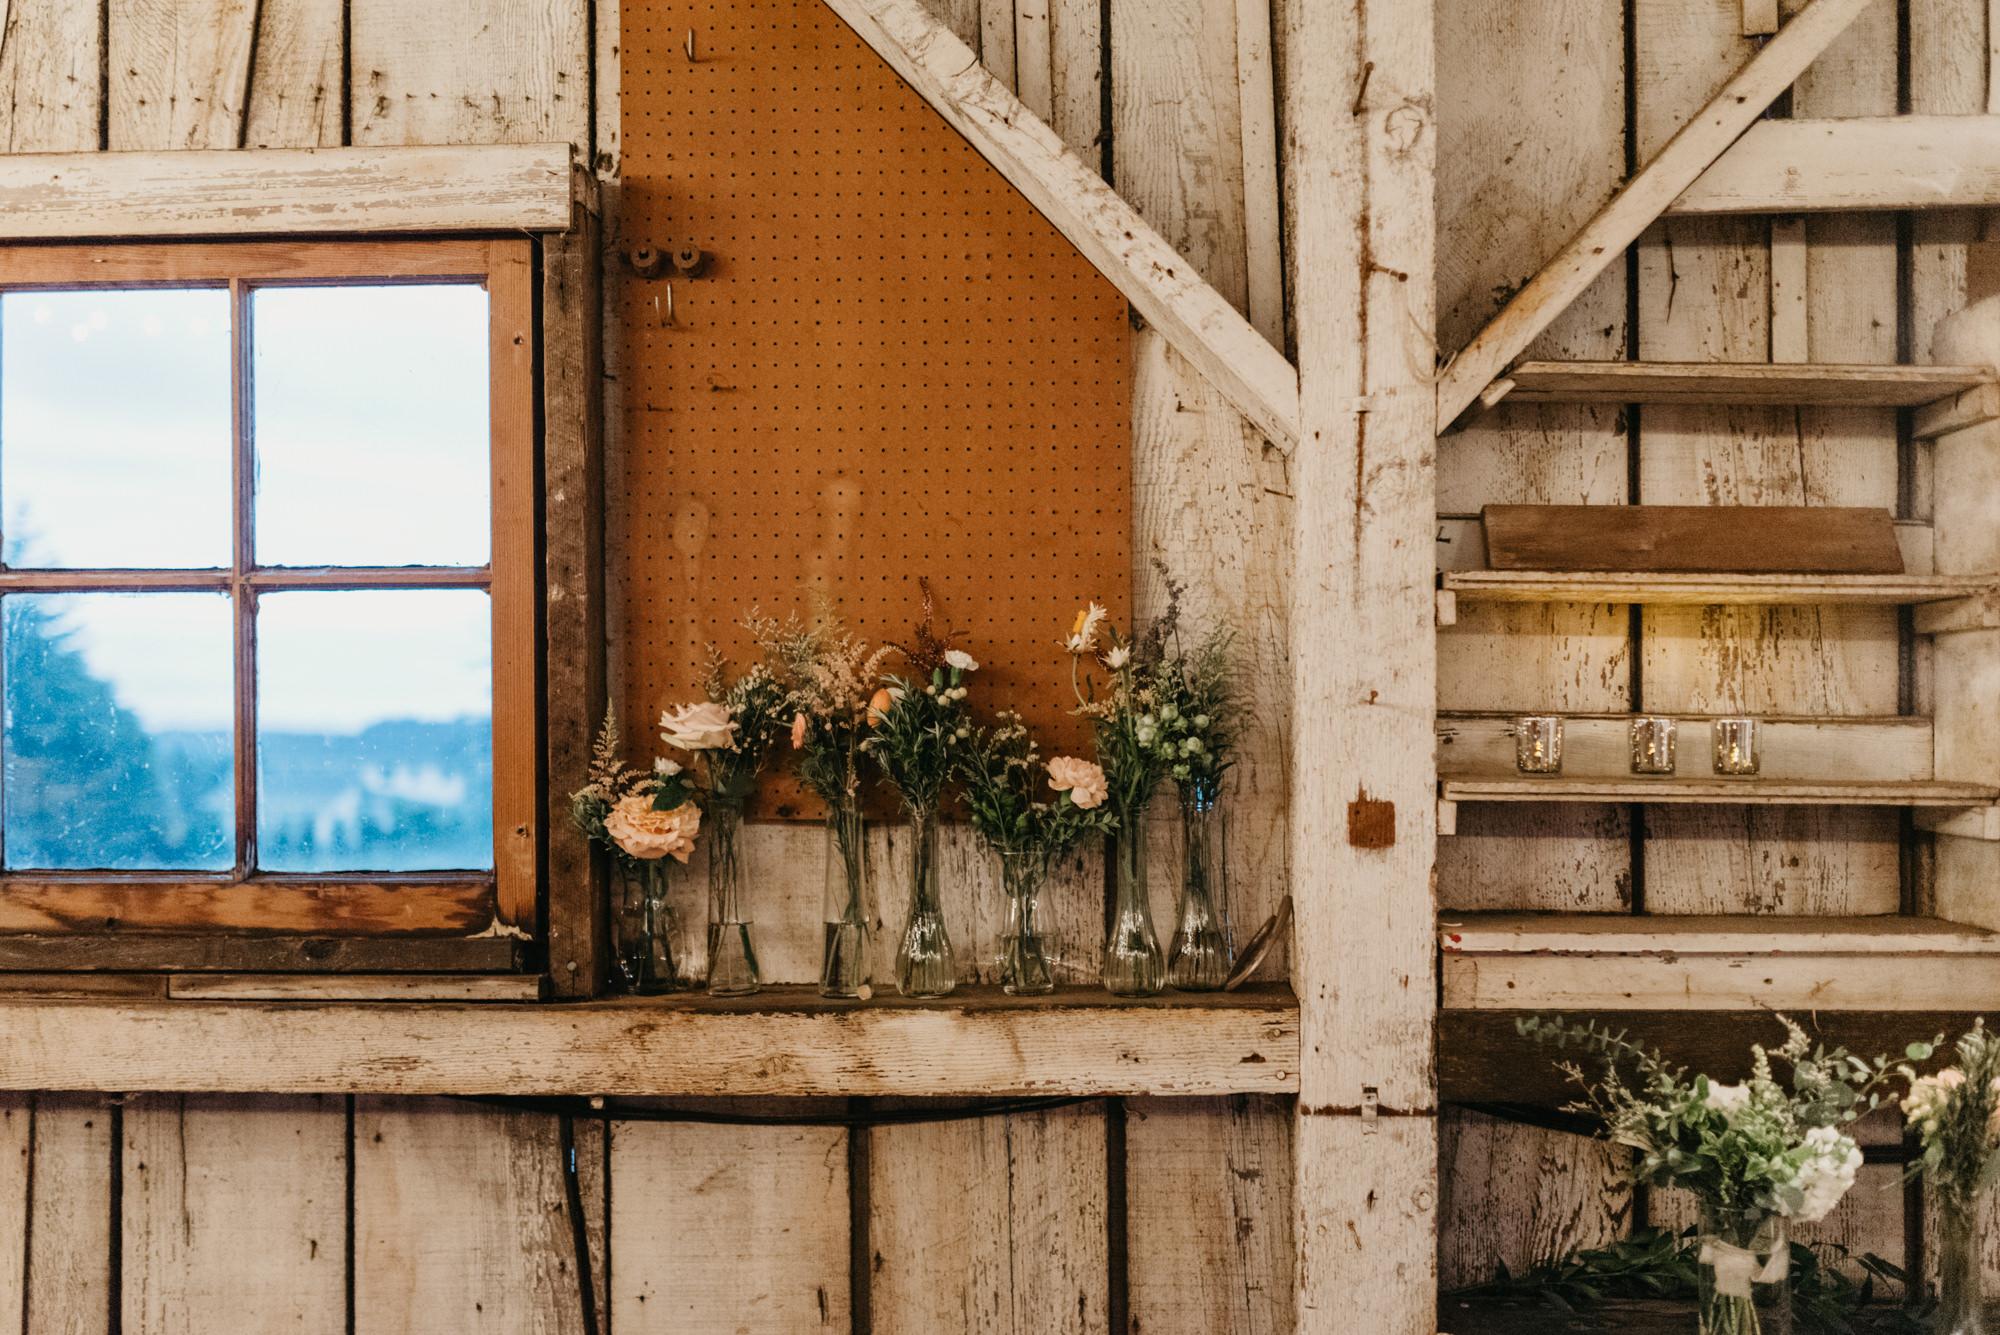 213-portland-northwest-wedding-bubble-exit-barn-string-lights.jpg